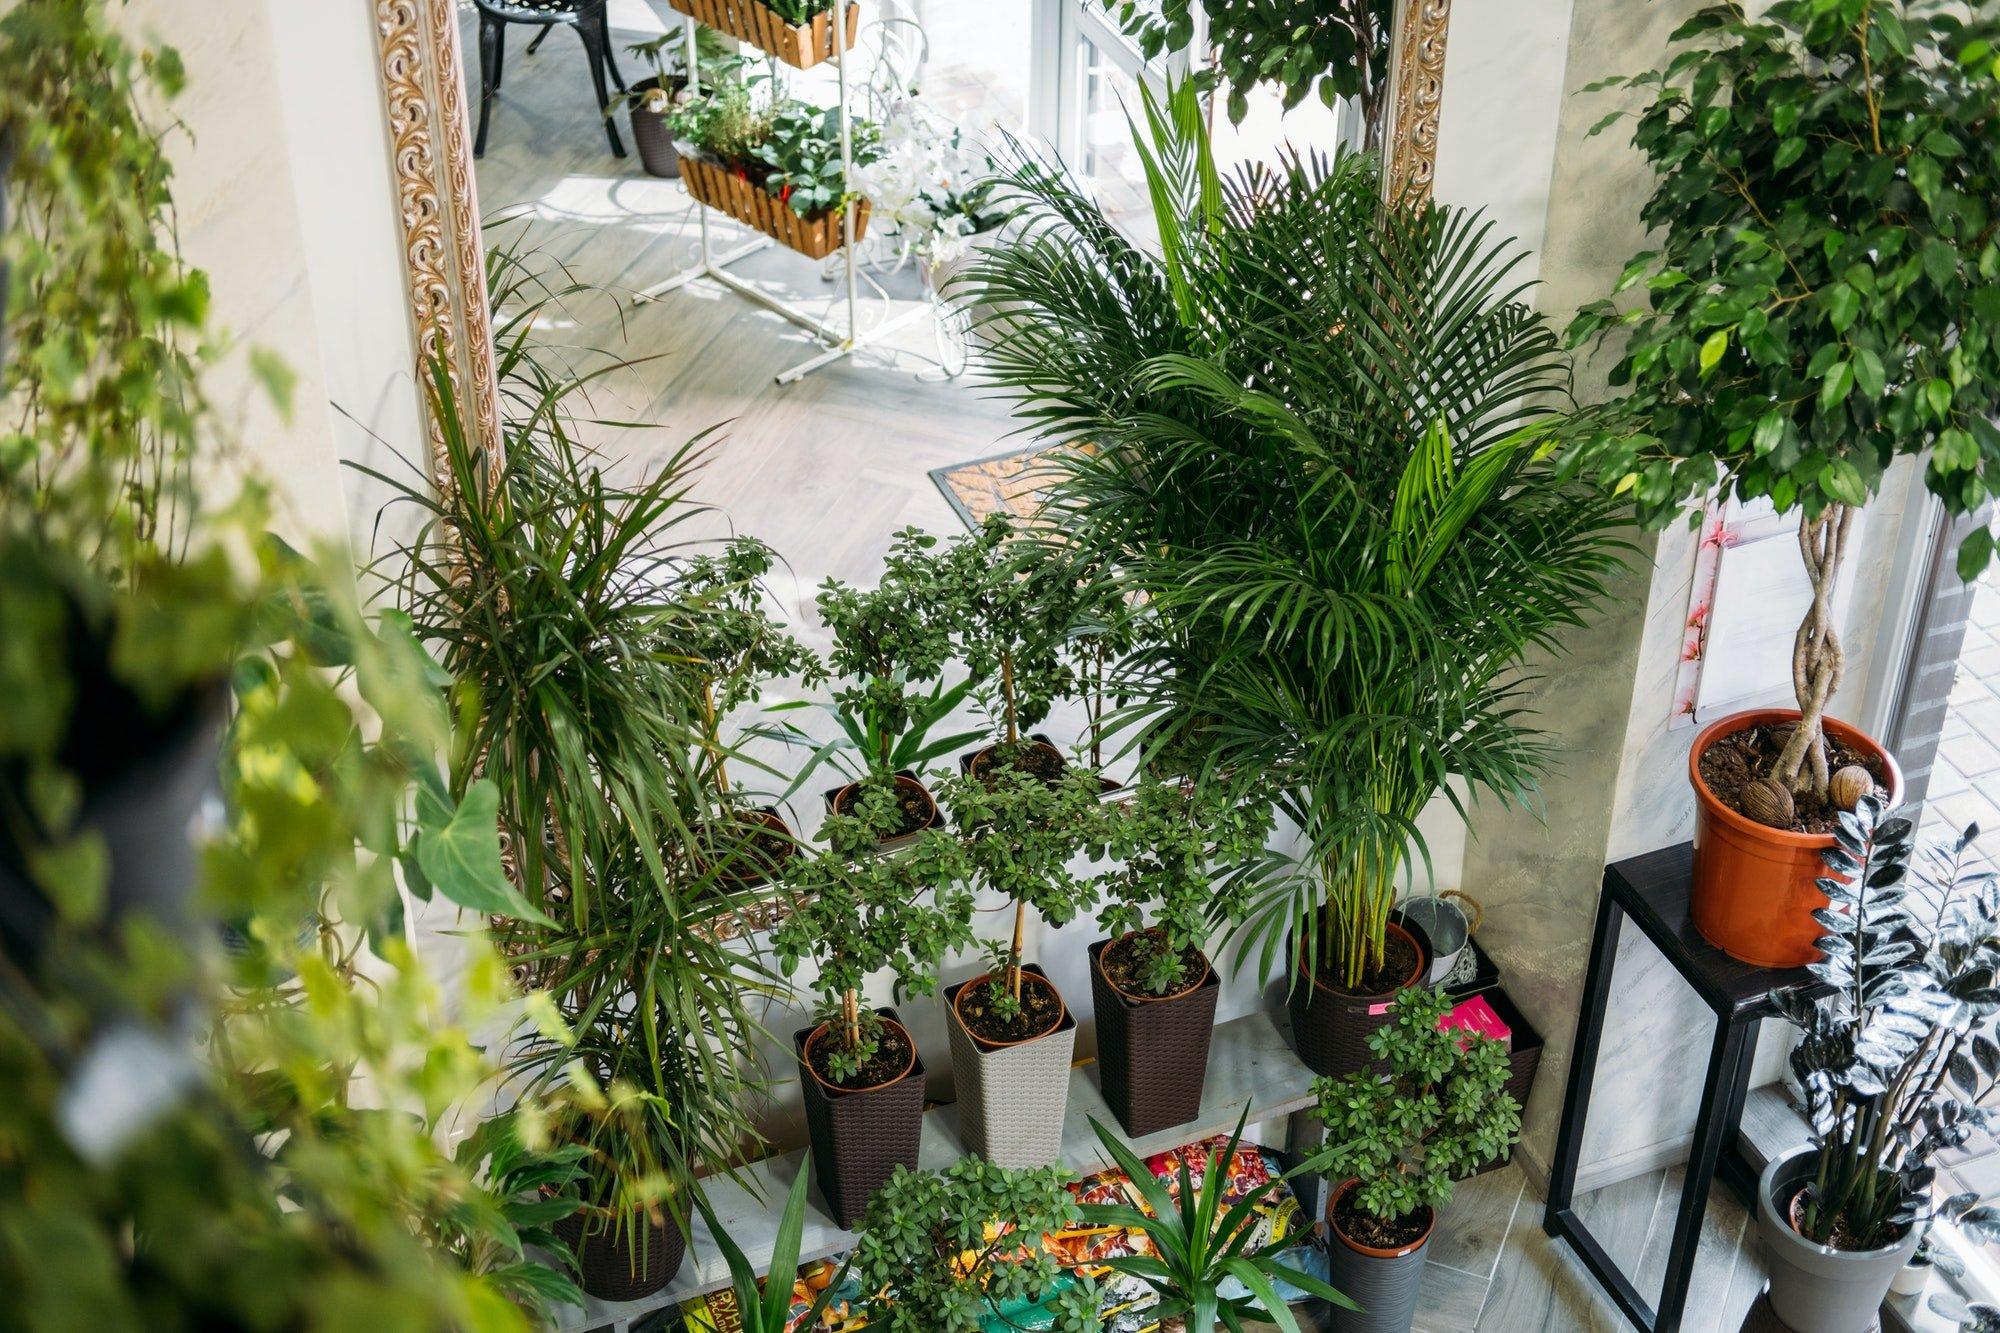 Garden room, Biophilia trend, Living with Nature, biophilic interior design. Many different indoor